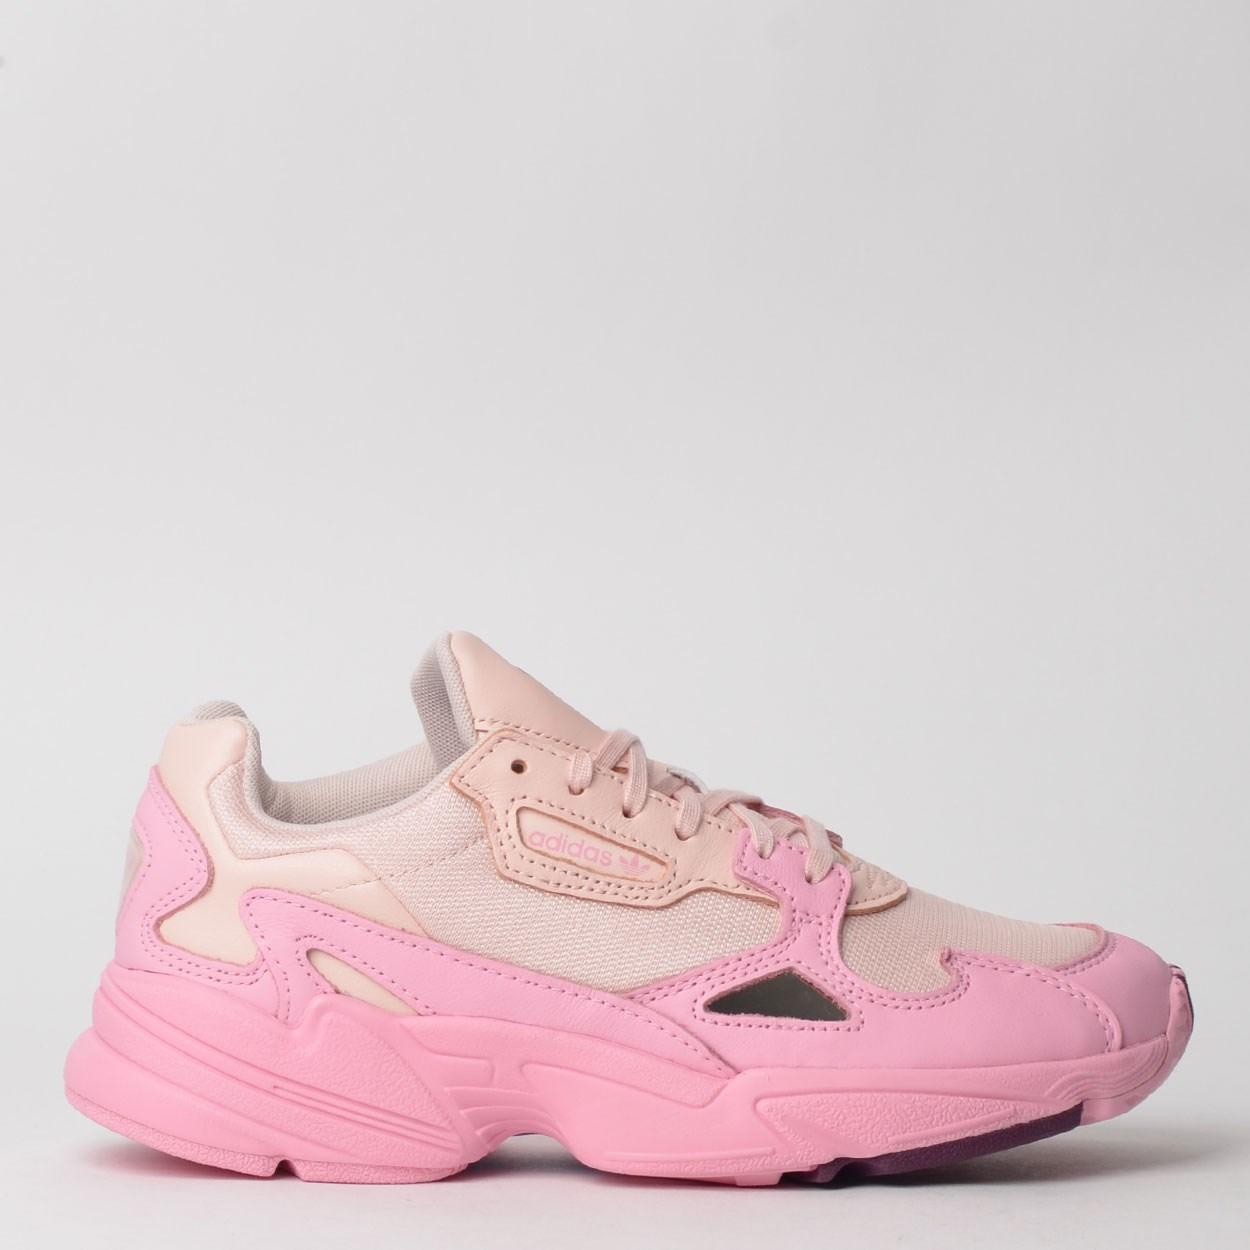 adidas falcon rosa e branco